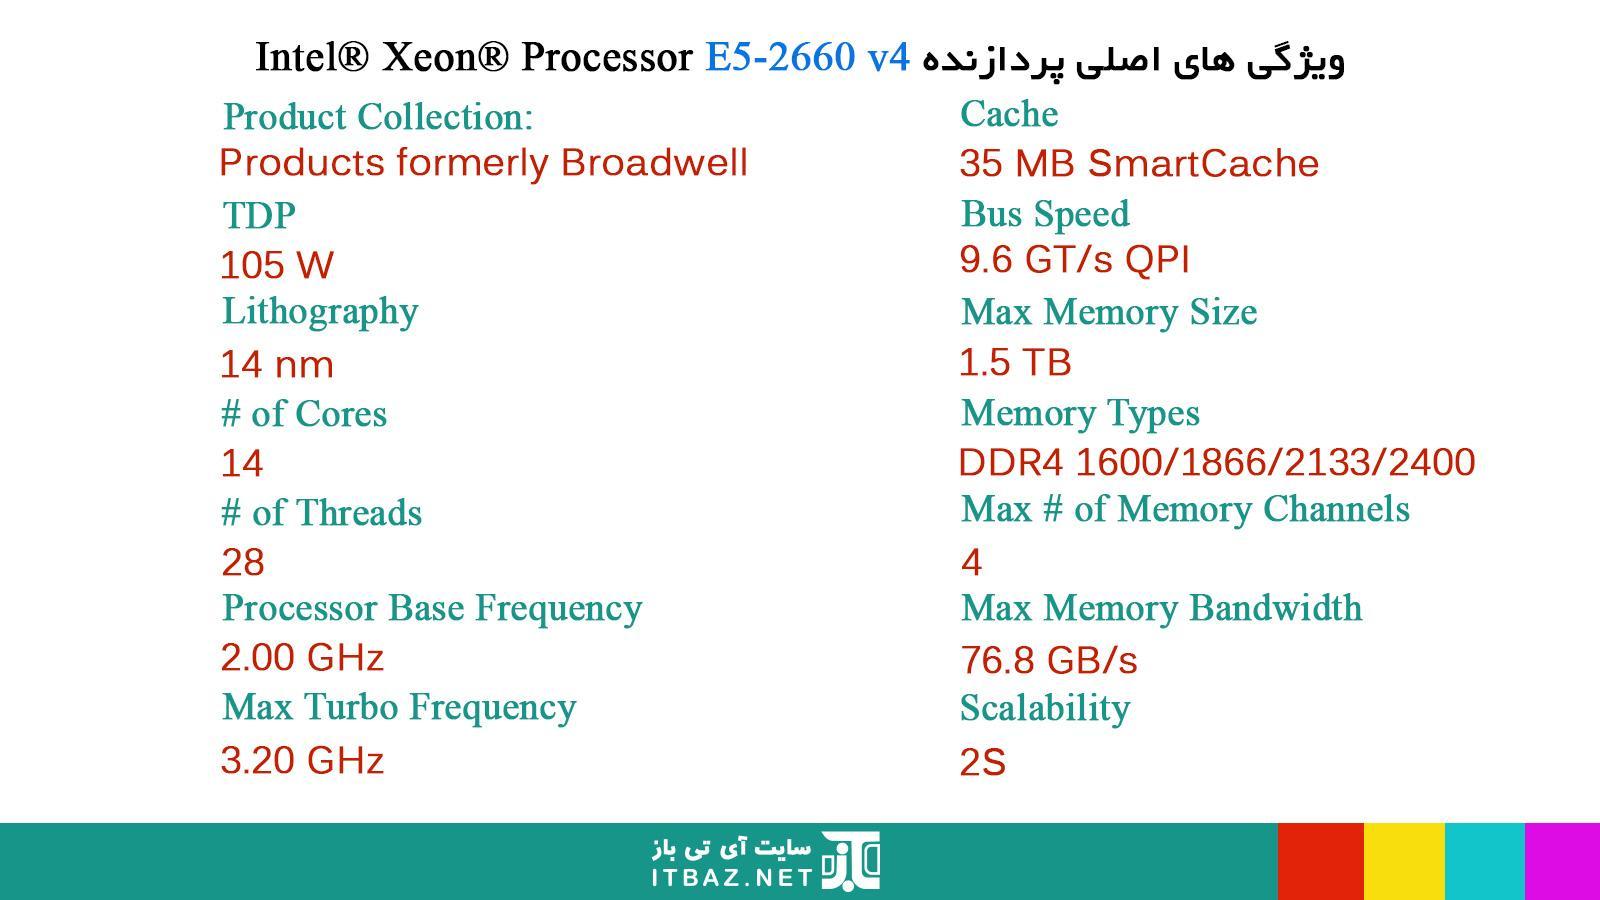 مشخصات سی پی یو intel xeon 2660 v4